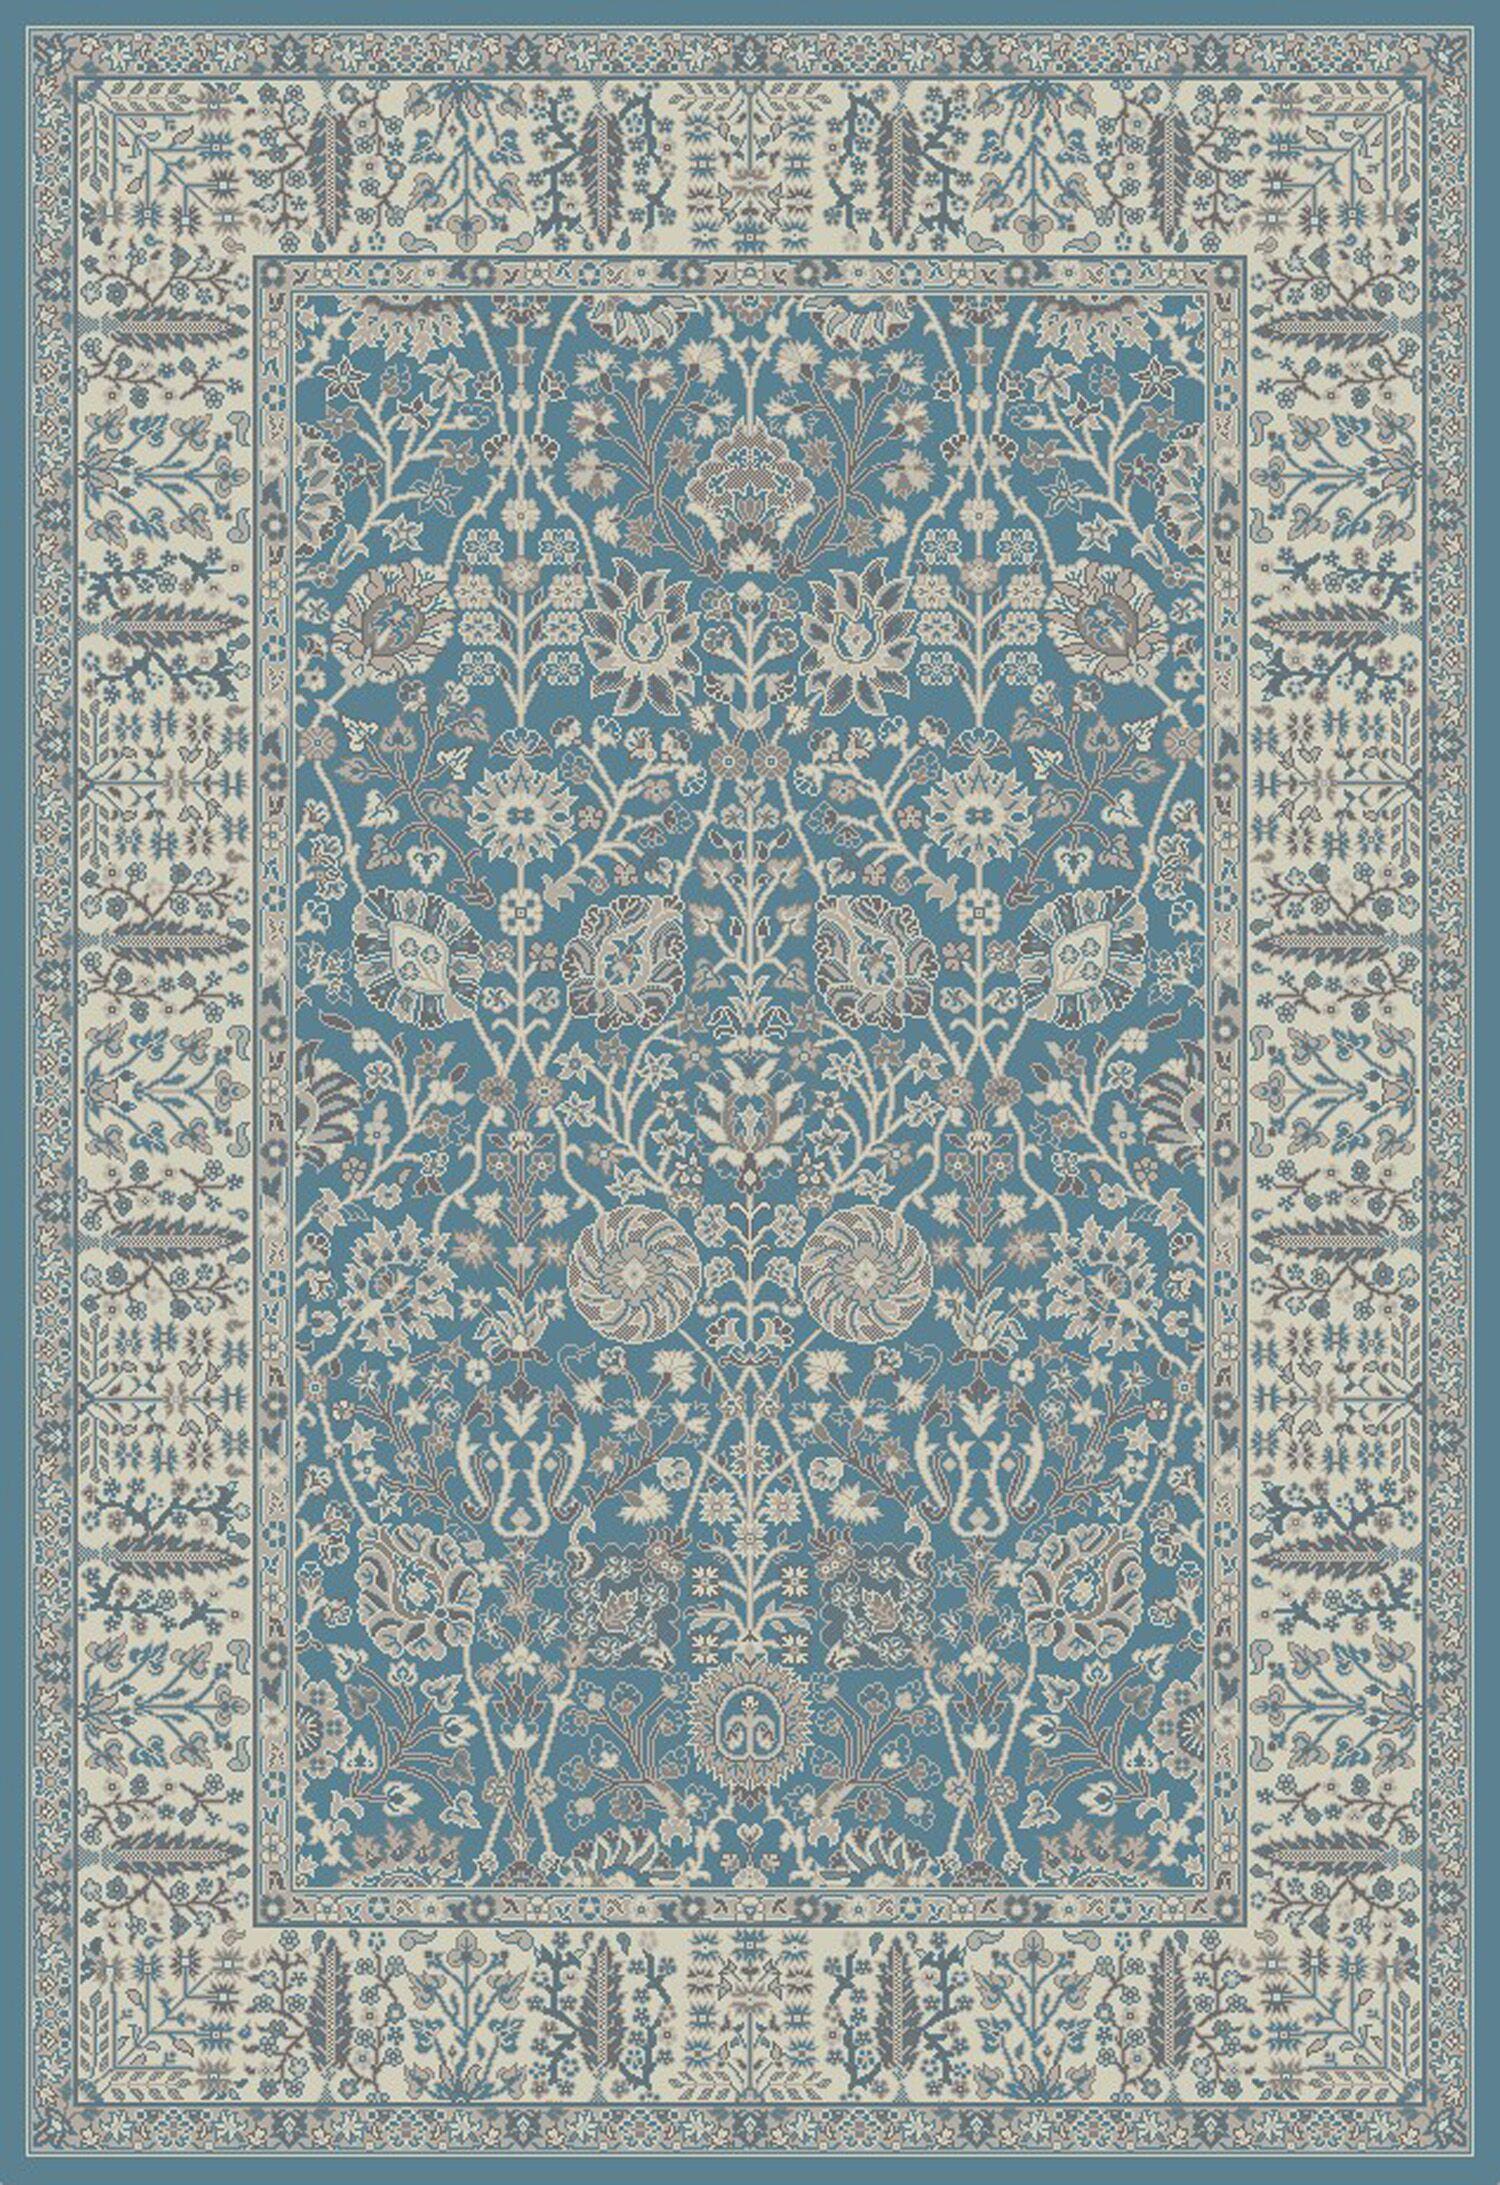 Tannen Garden Blue Area Rug Rug Size: 8' x 10'